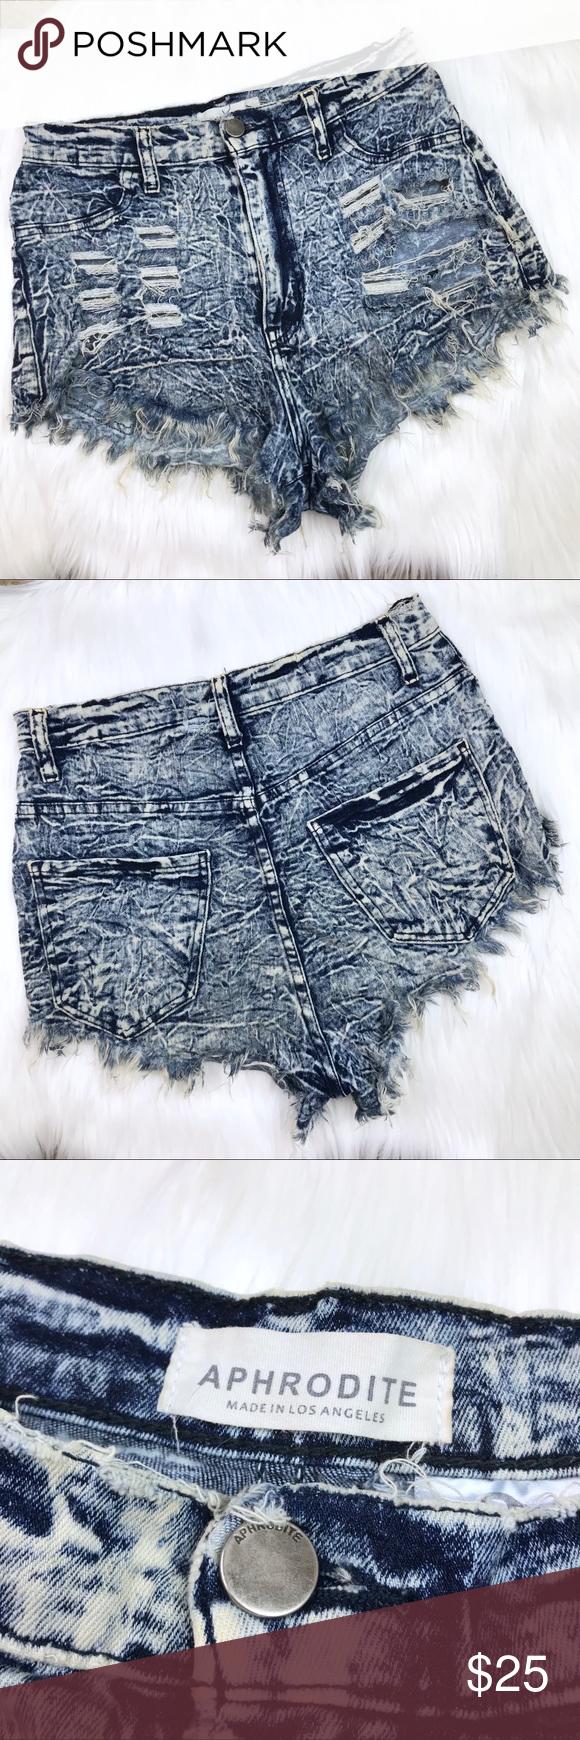 "871d8ac0ea [Aphrodite] High Waist Acid Wash Distressed Shorts Aphrodite High Waist  Acid Wash Distressed Stretch Denim Shorts size Medium. 12"" rise. Made in  USA."